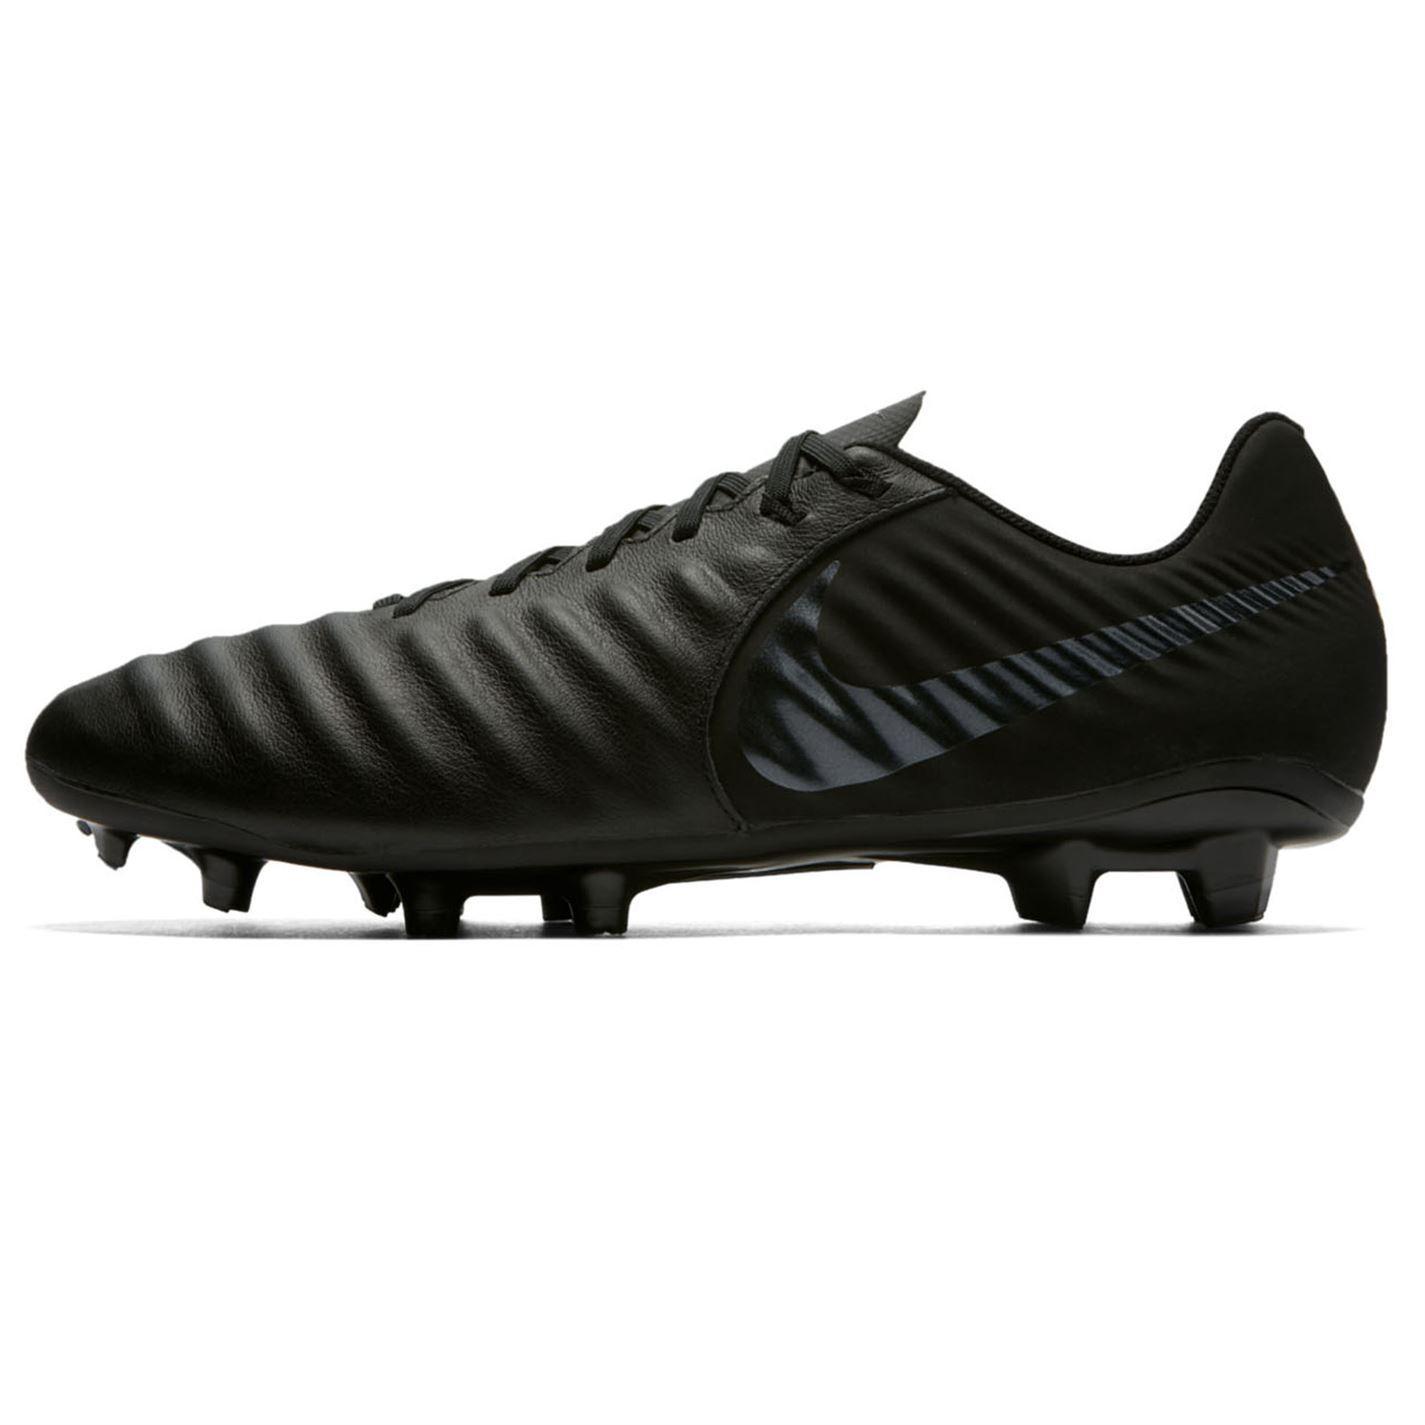 Nike-Tiempo-Legend-Academy-FG-Firm-Ground-Chaussures-De-Football-Homme-Football-Chaussures-Crampons miniature 8